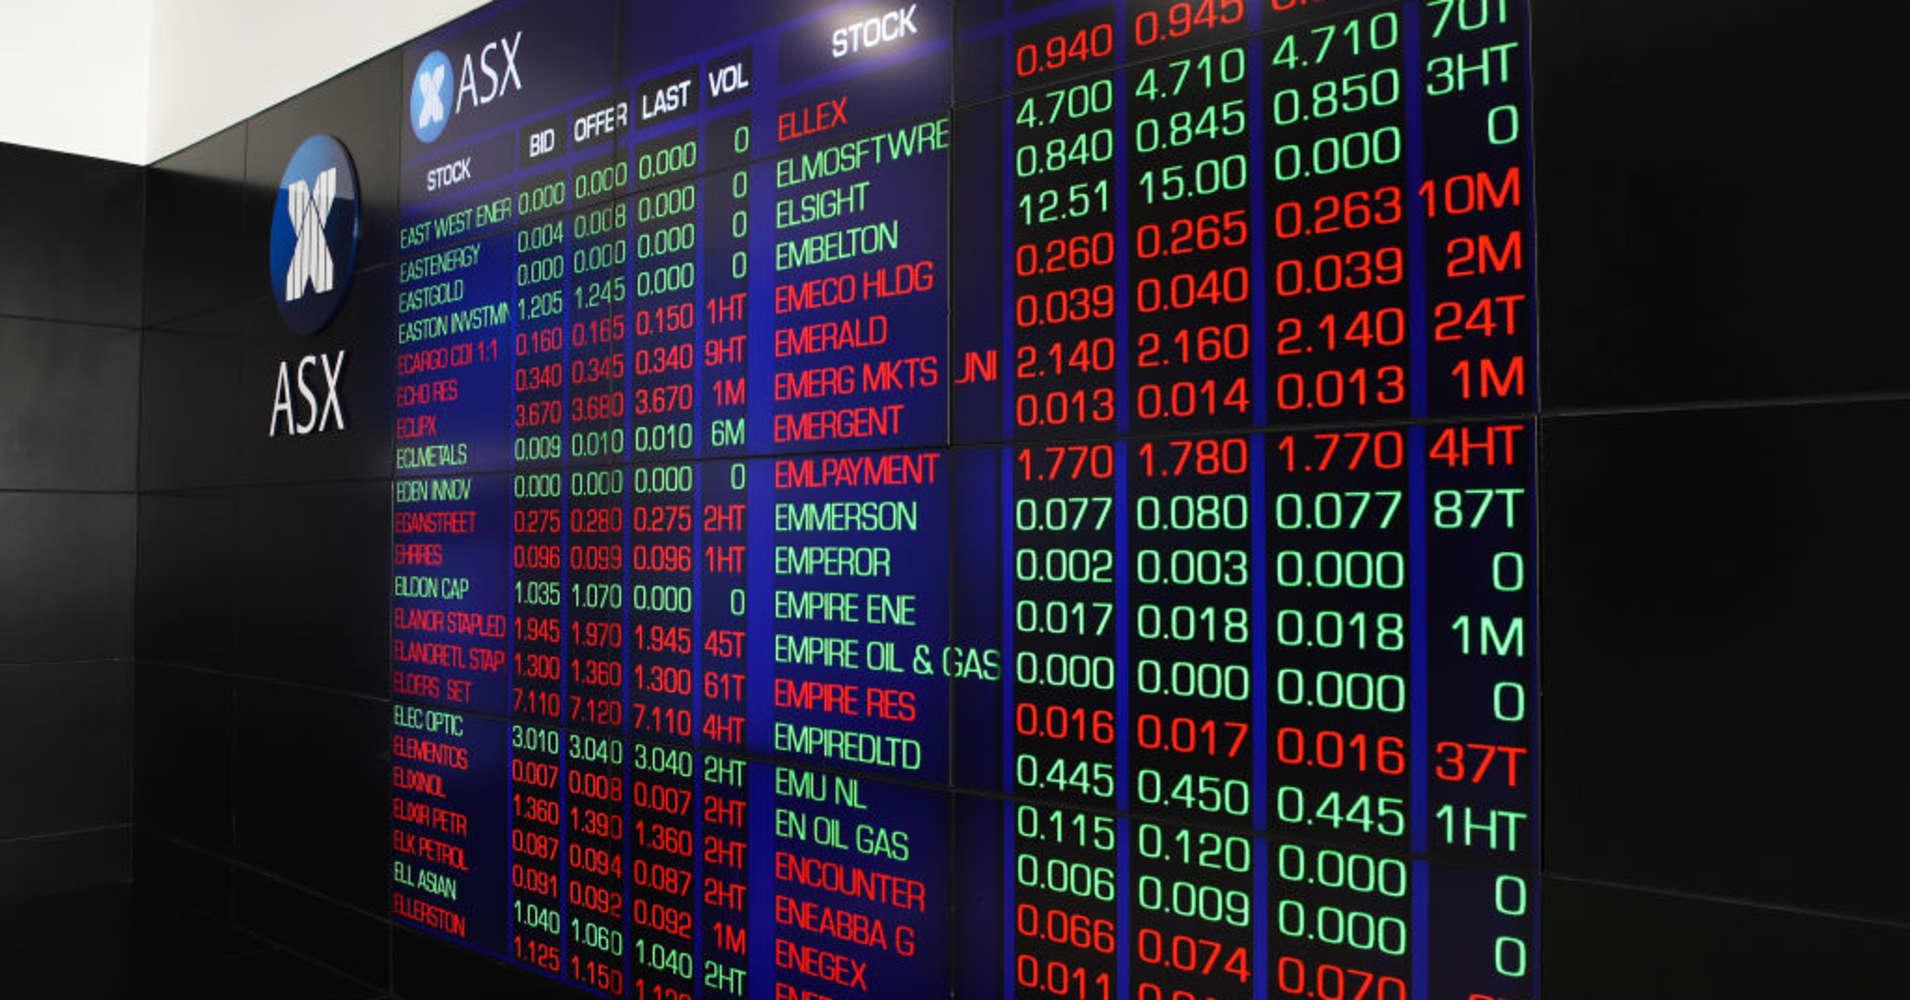 Asian shares slip as the dollar firms; HSBC falls 3.1%